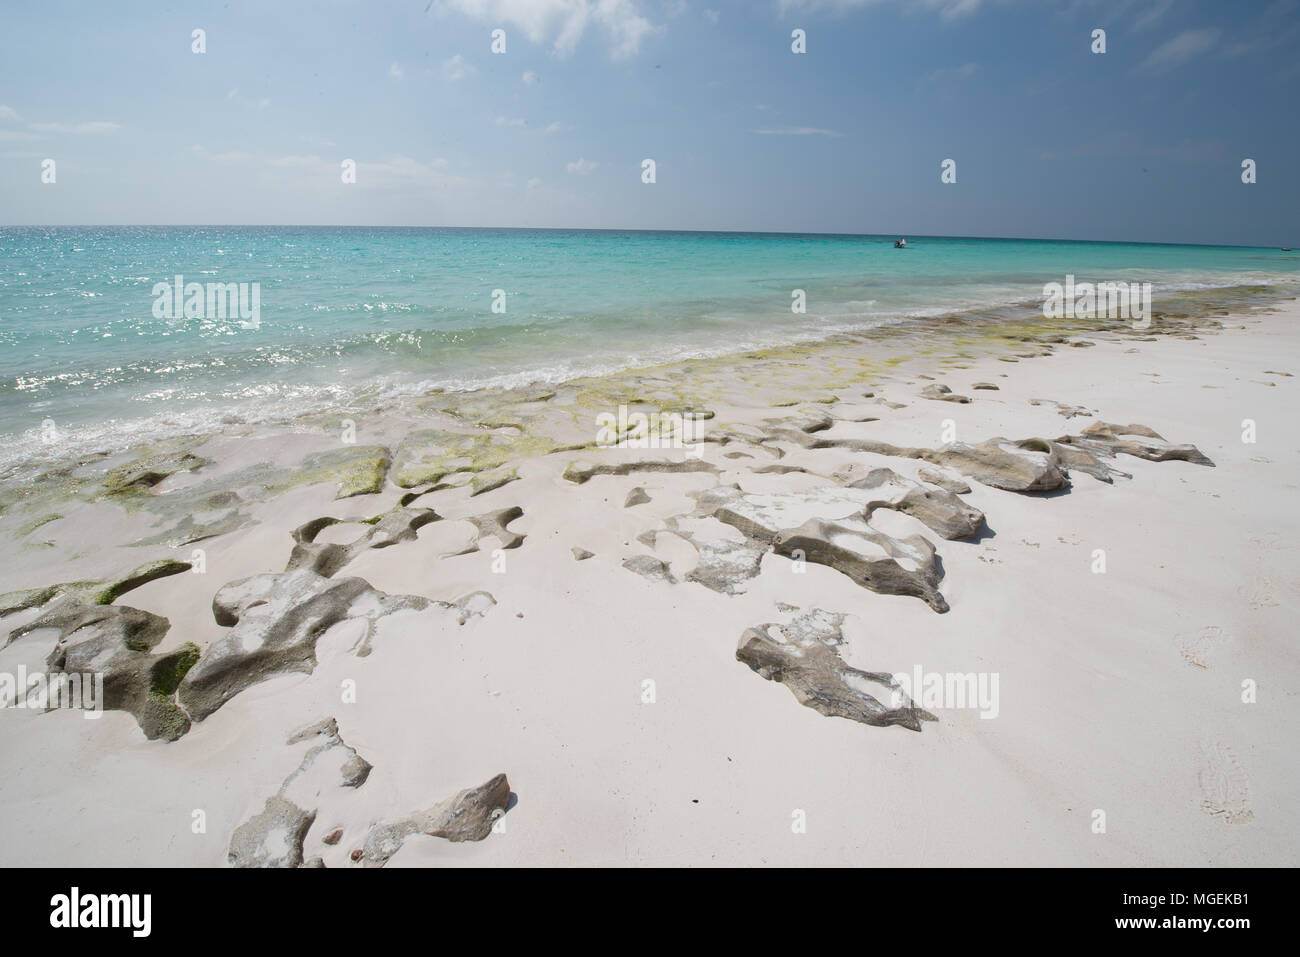 Nature of the Socotra Island, Yemen - Stock Image